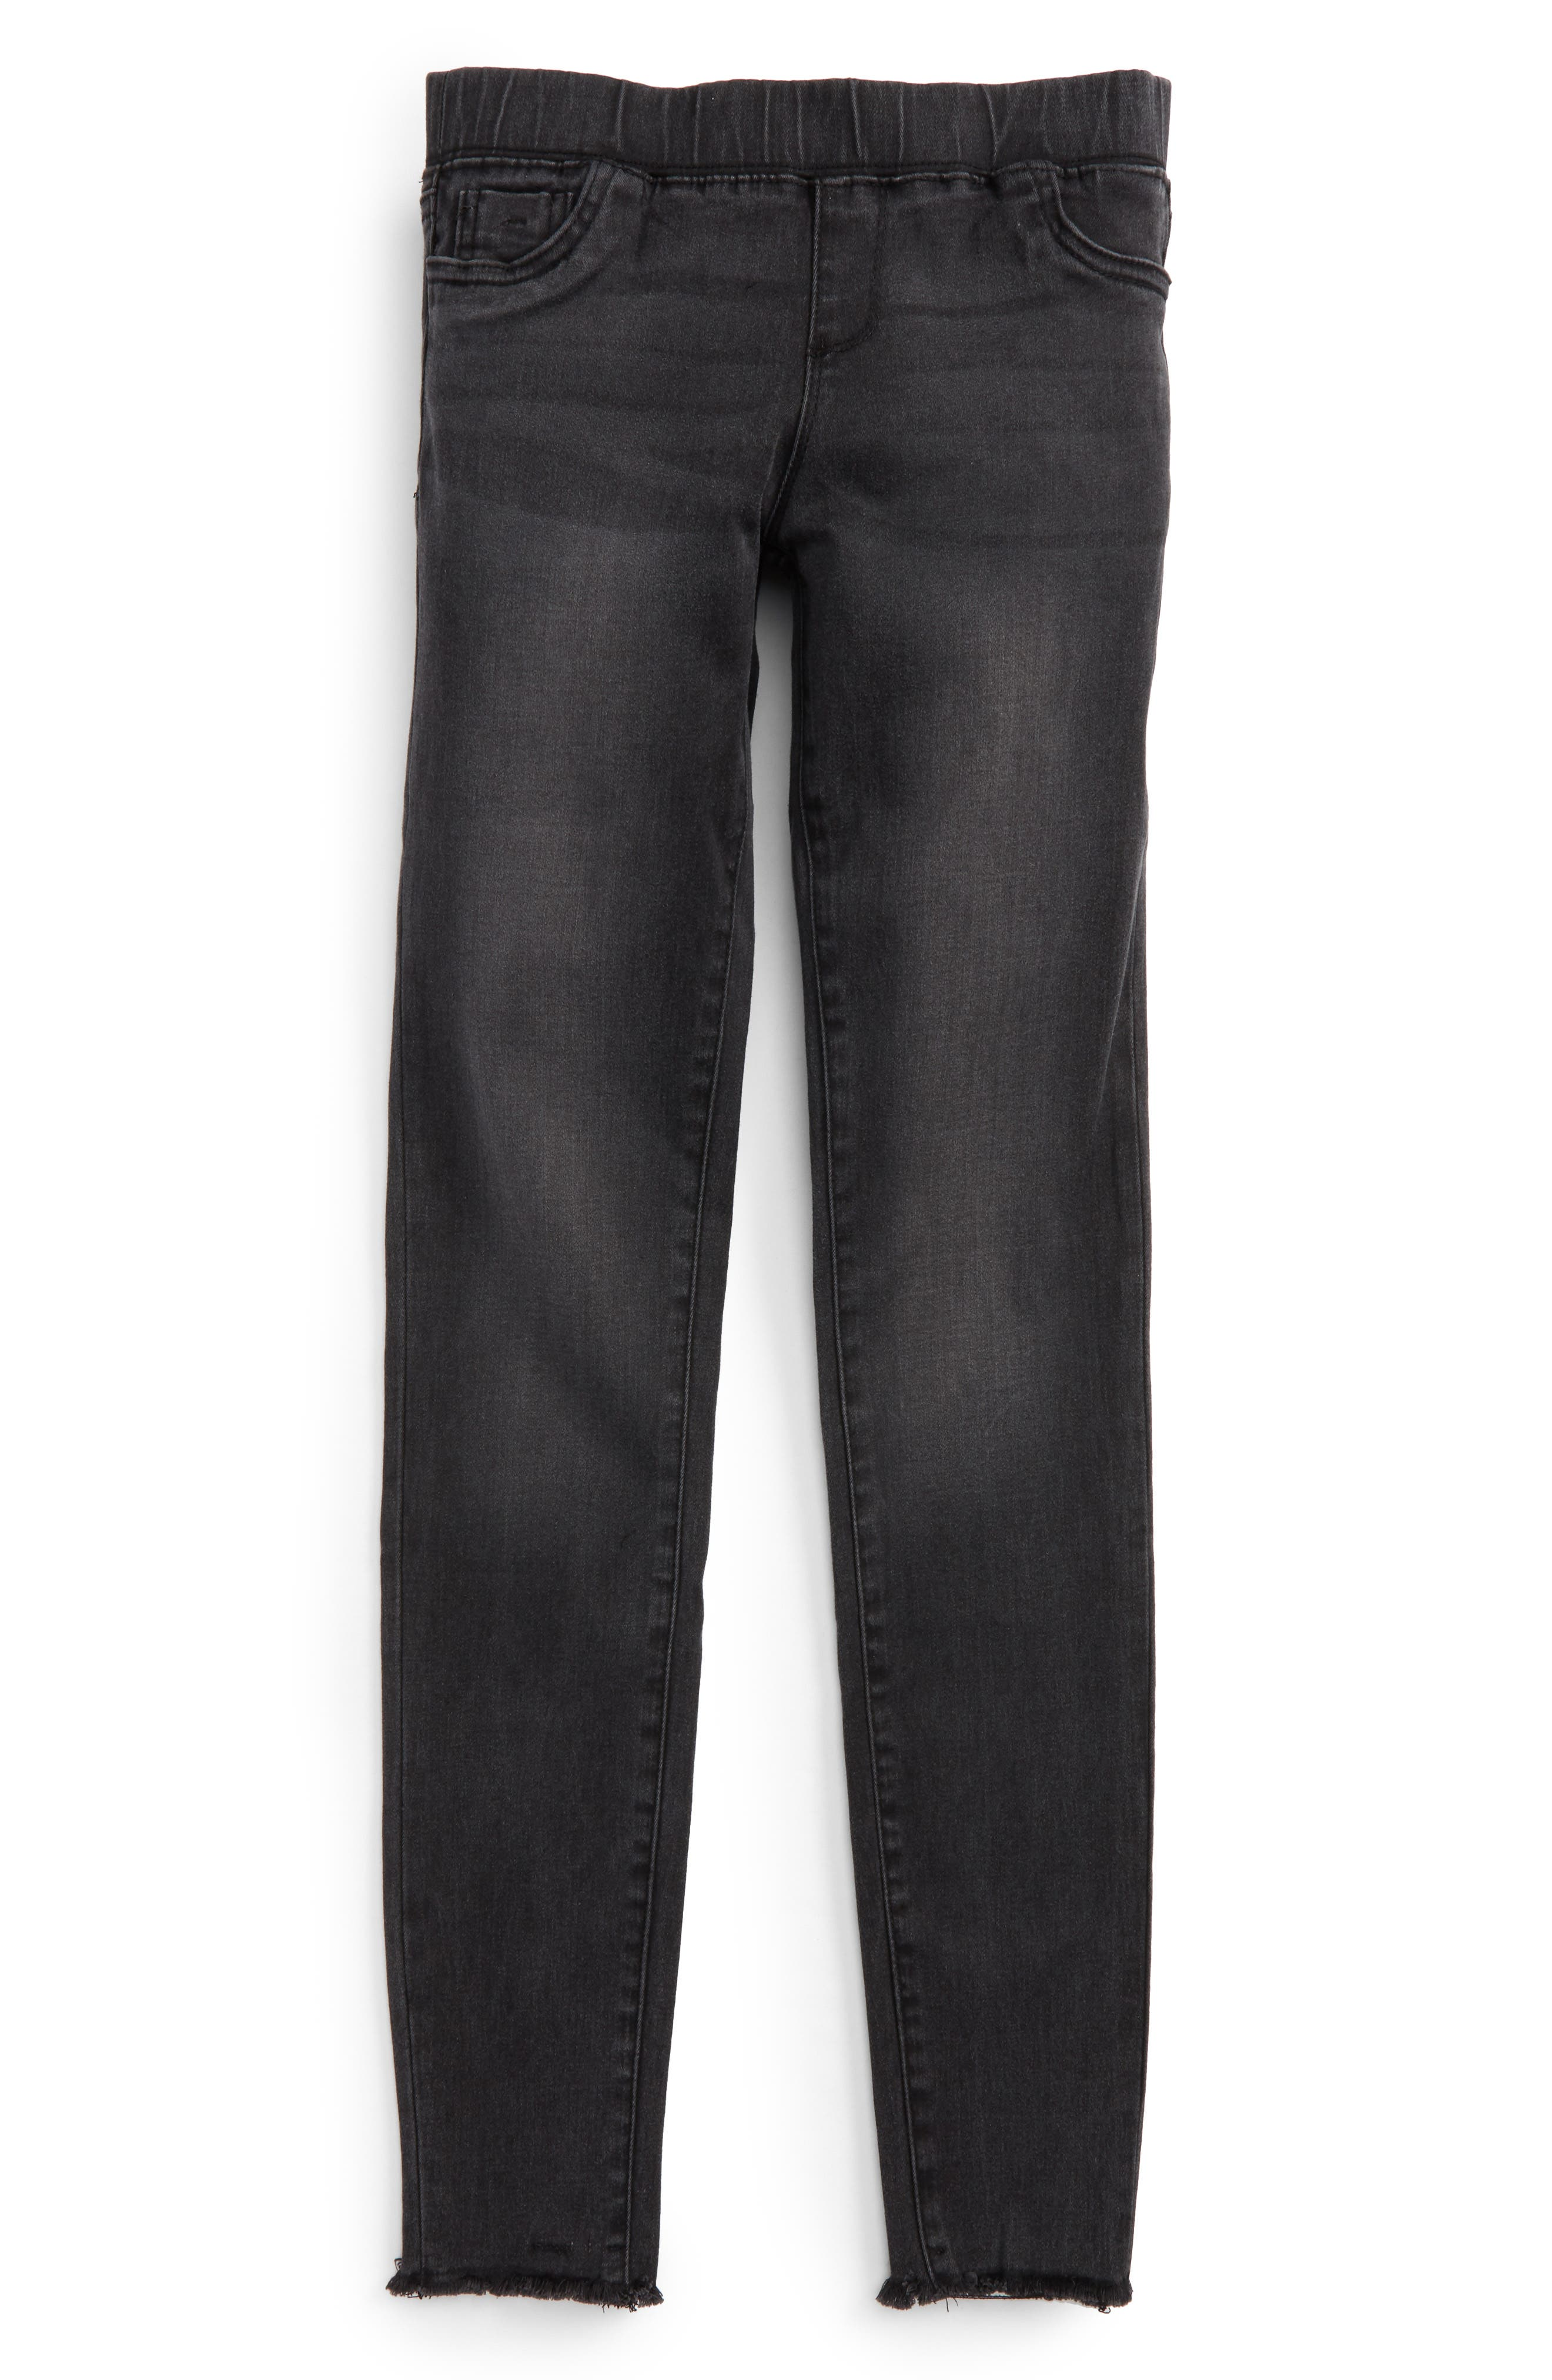 Alternate Image 1 Selected - Tractr Frayed Denim Pants (Big Girls)